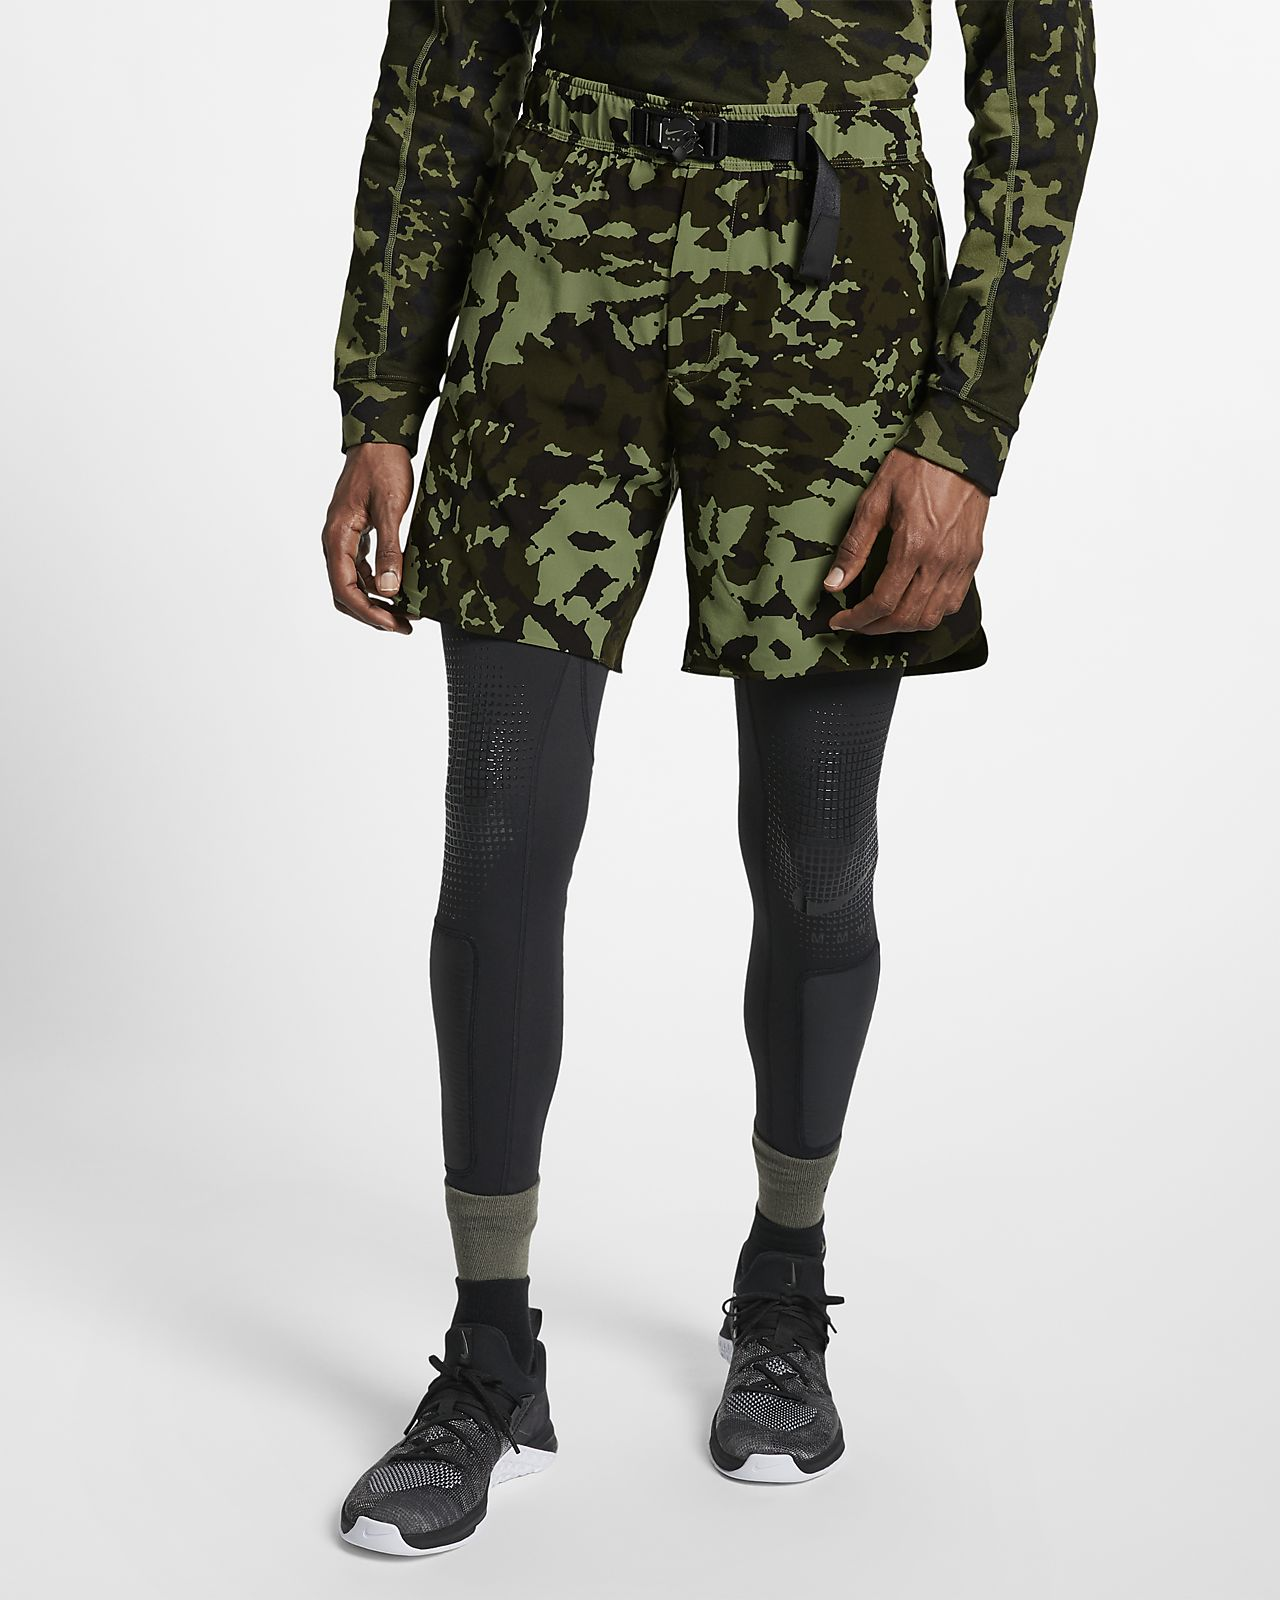 Nike x MMW Men's 2-in-1 Shorts